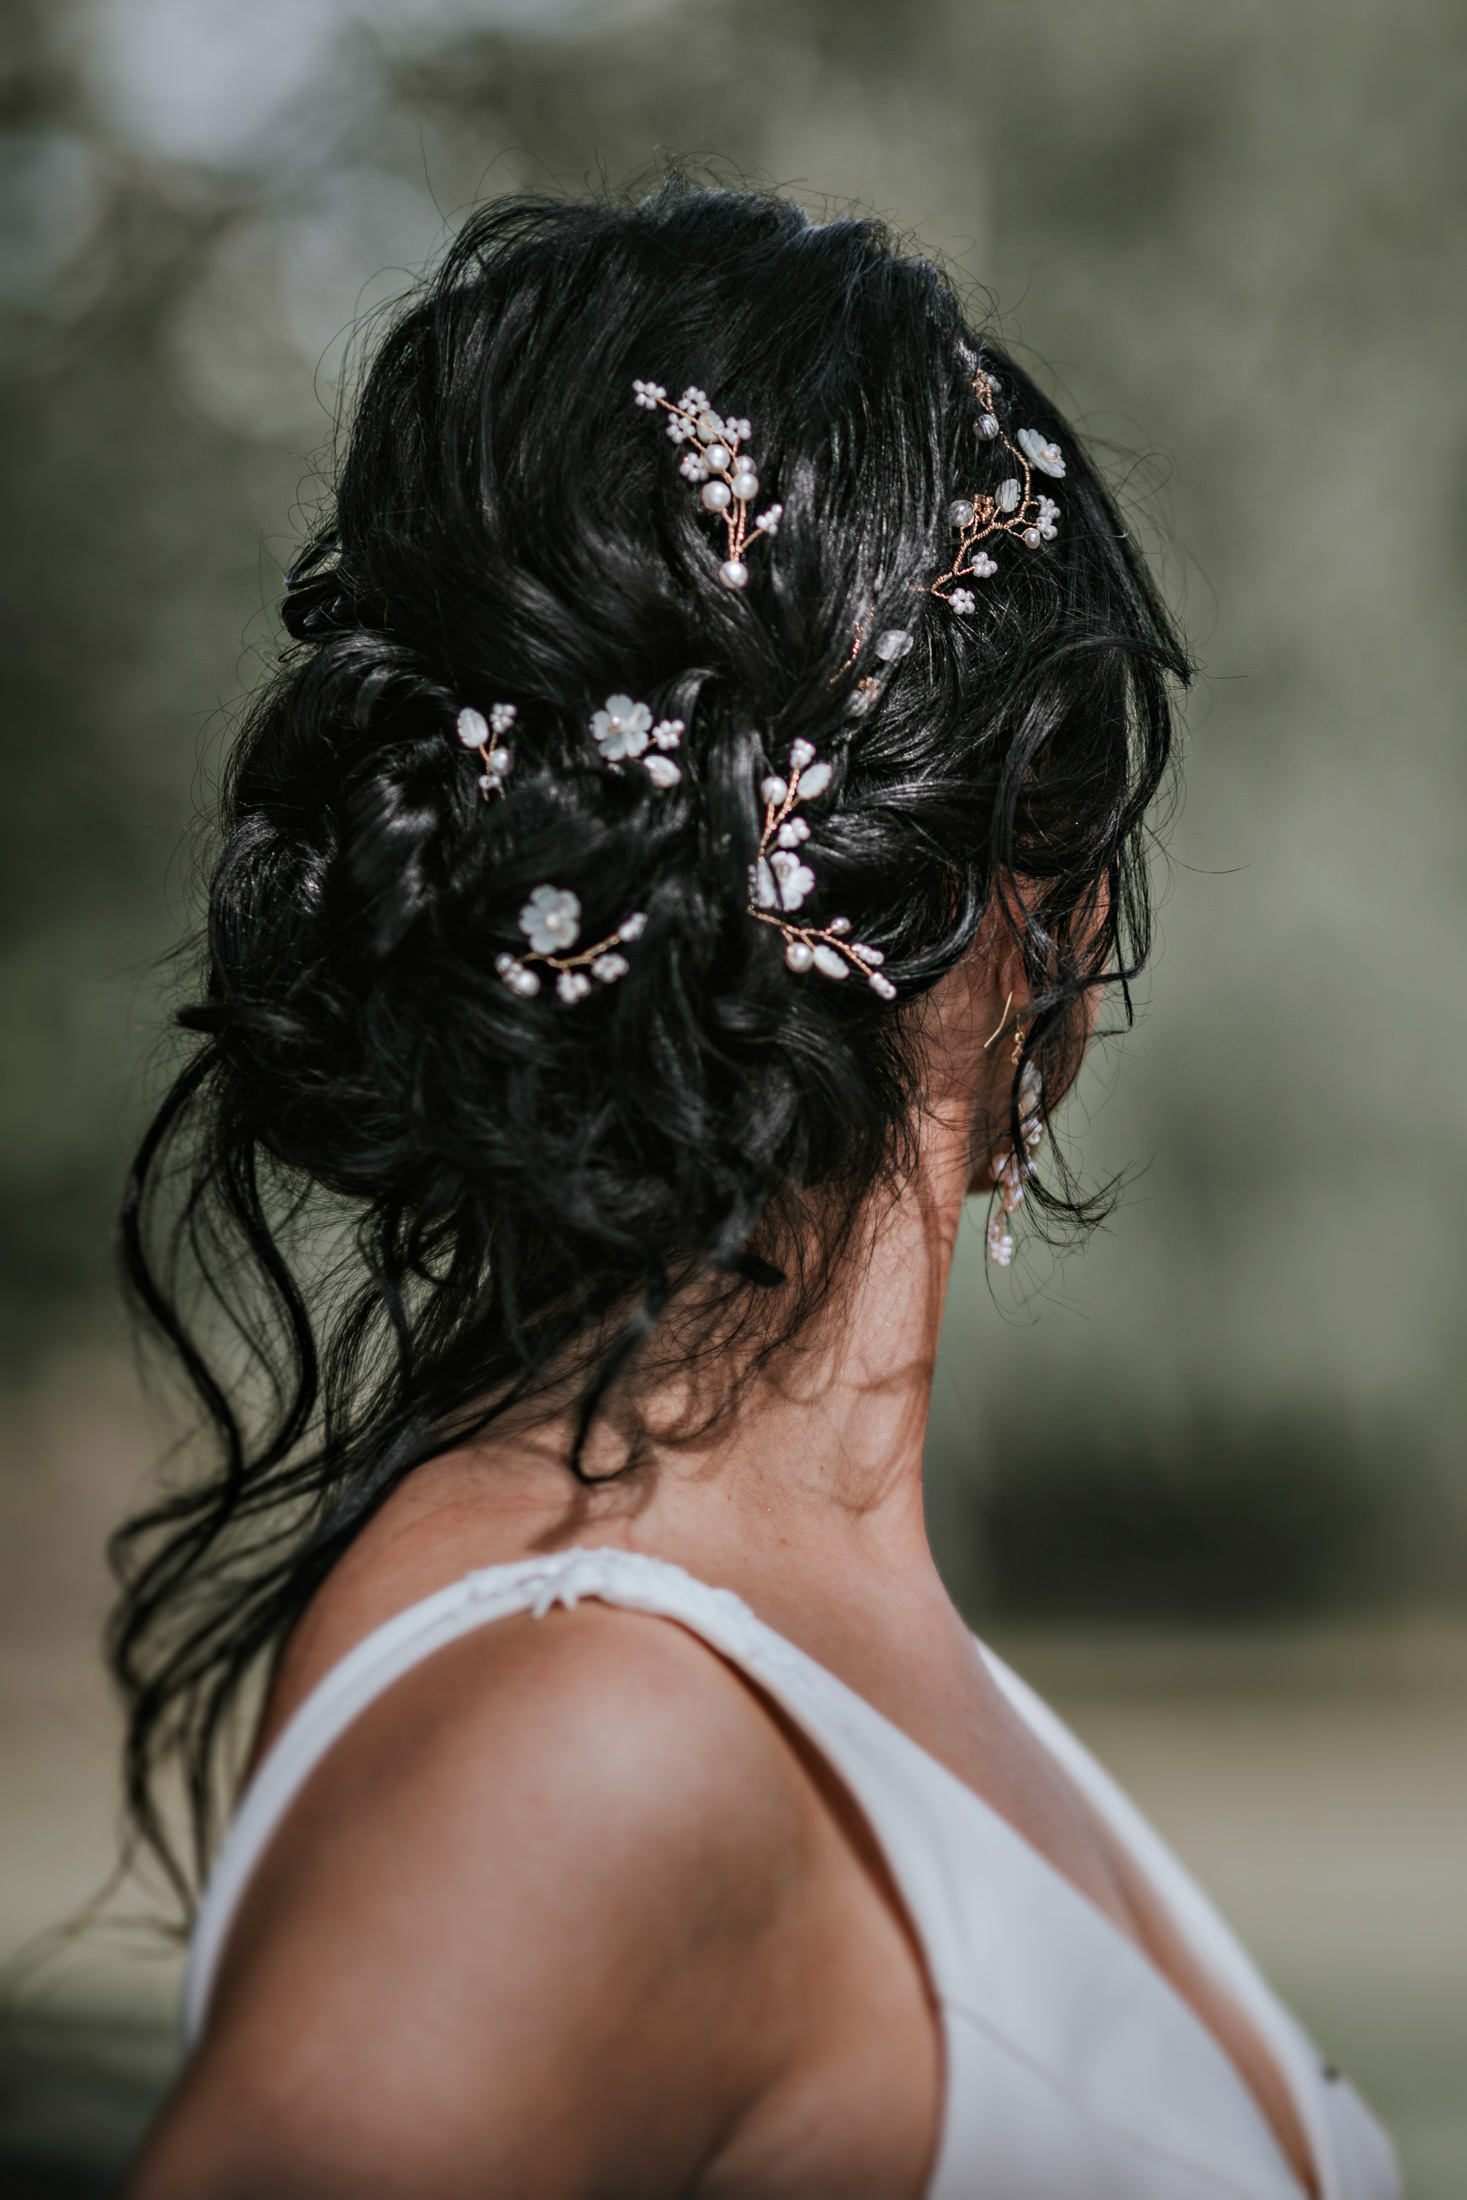 Woodland Wedding - nottingham outdoor wedding venue - east midlands wedding planner - bridal hair accessories - elegant bridal hair